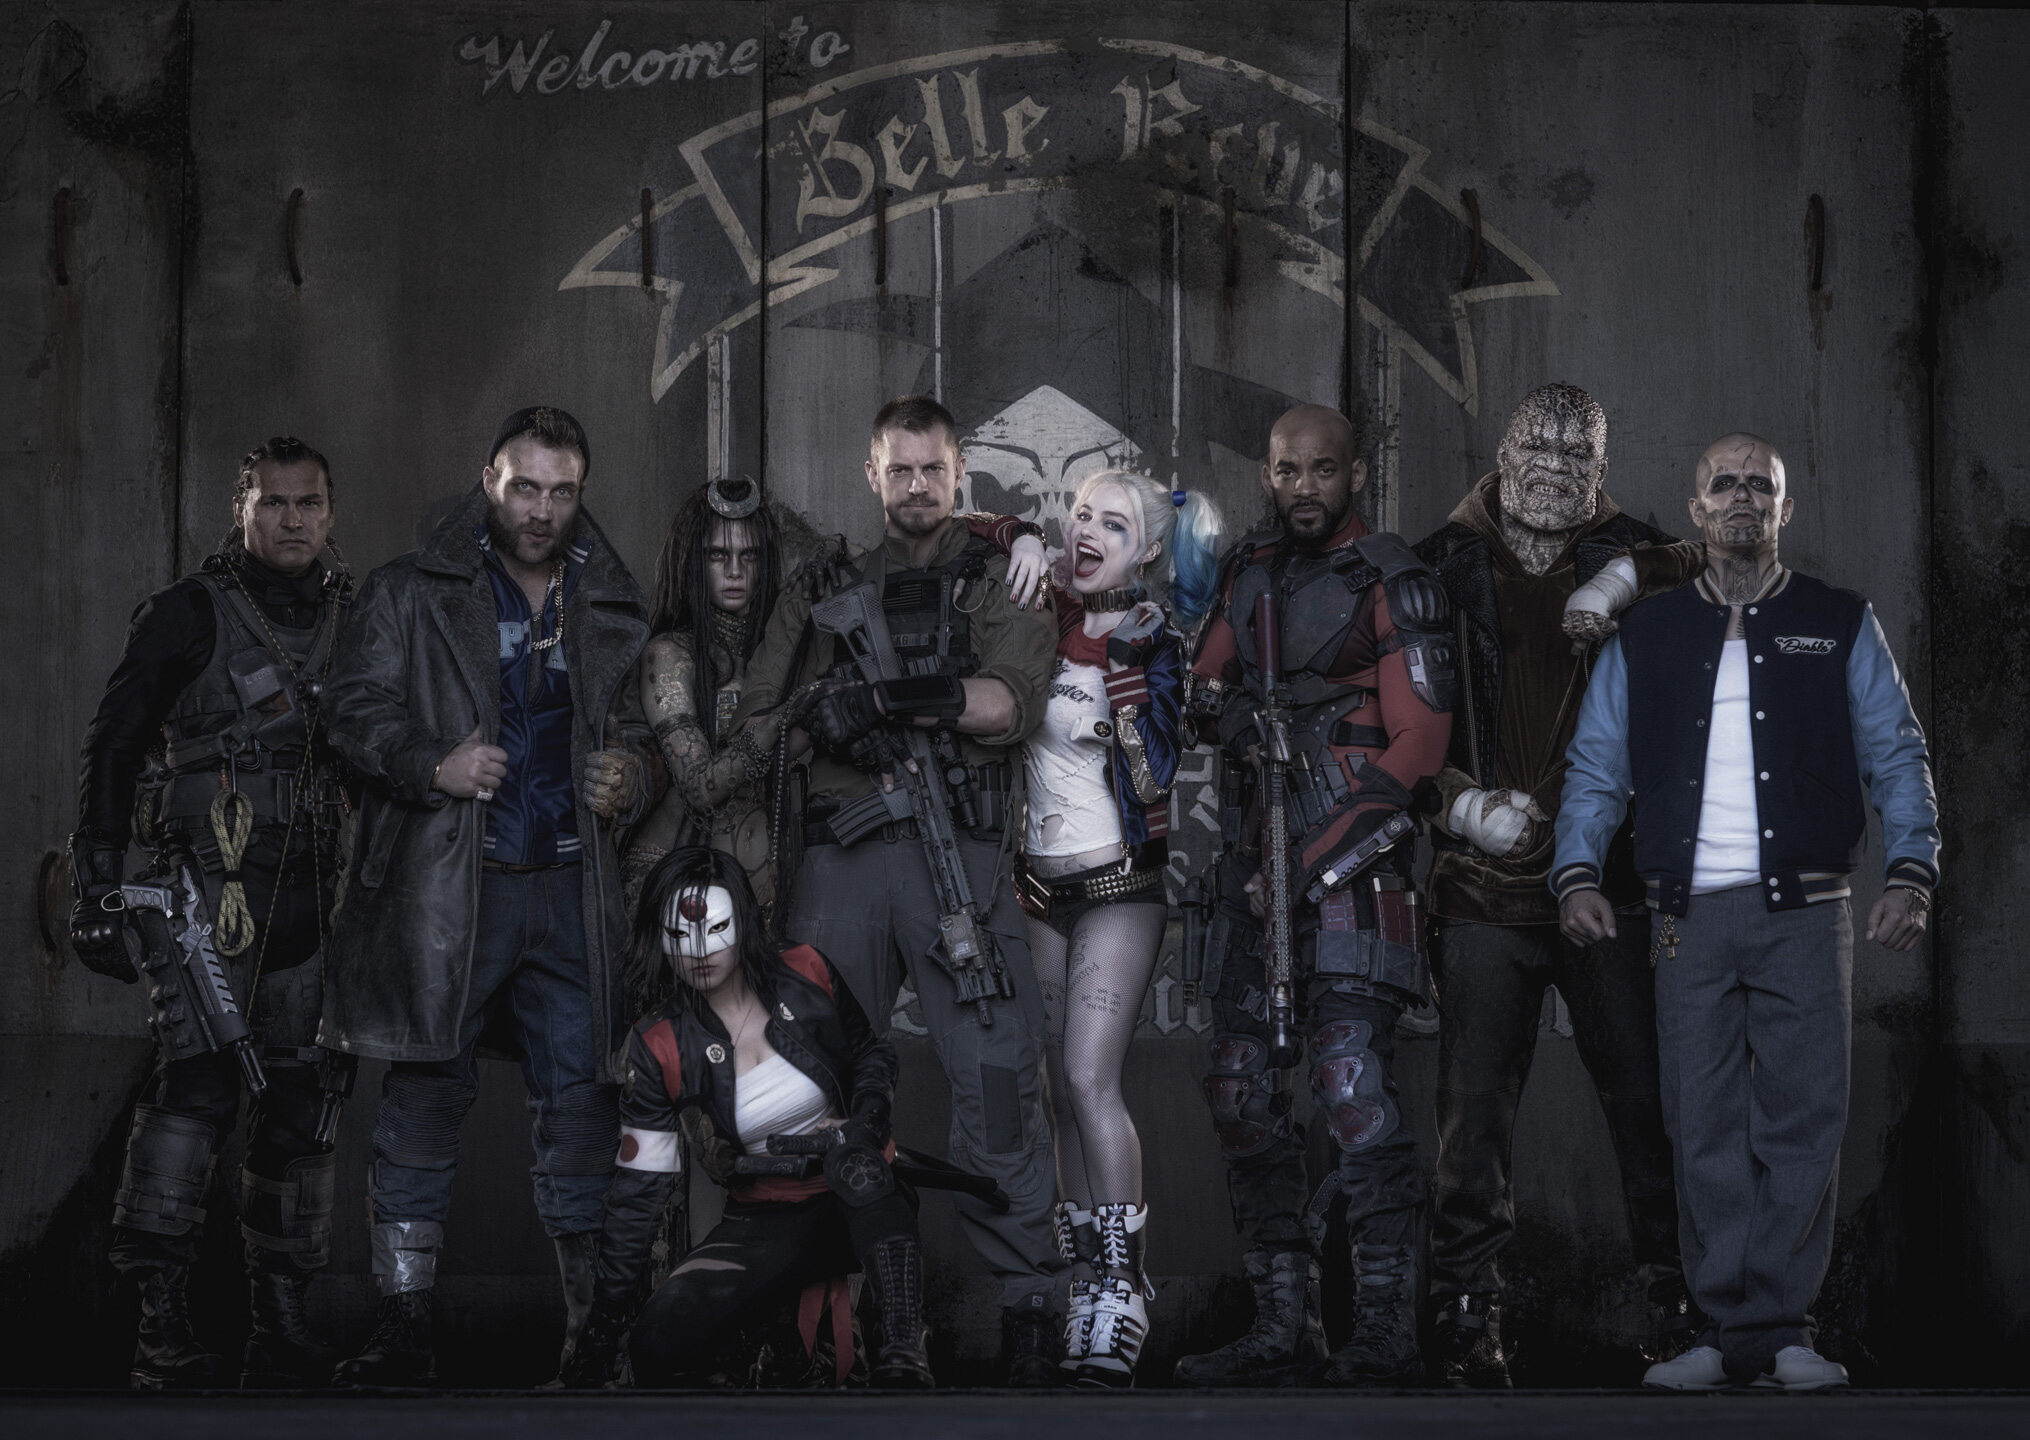 Legion samobójców / Suicide Squad (2016)